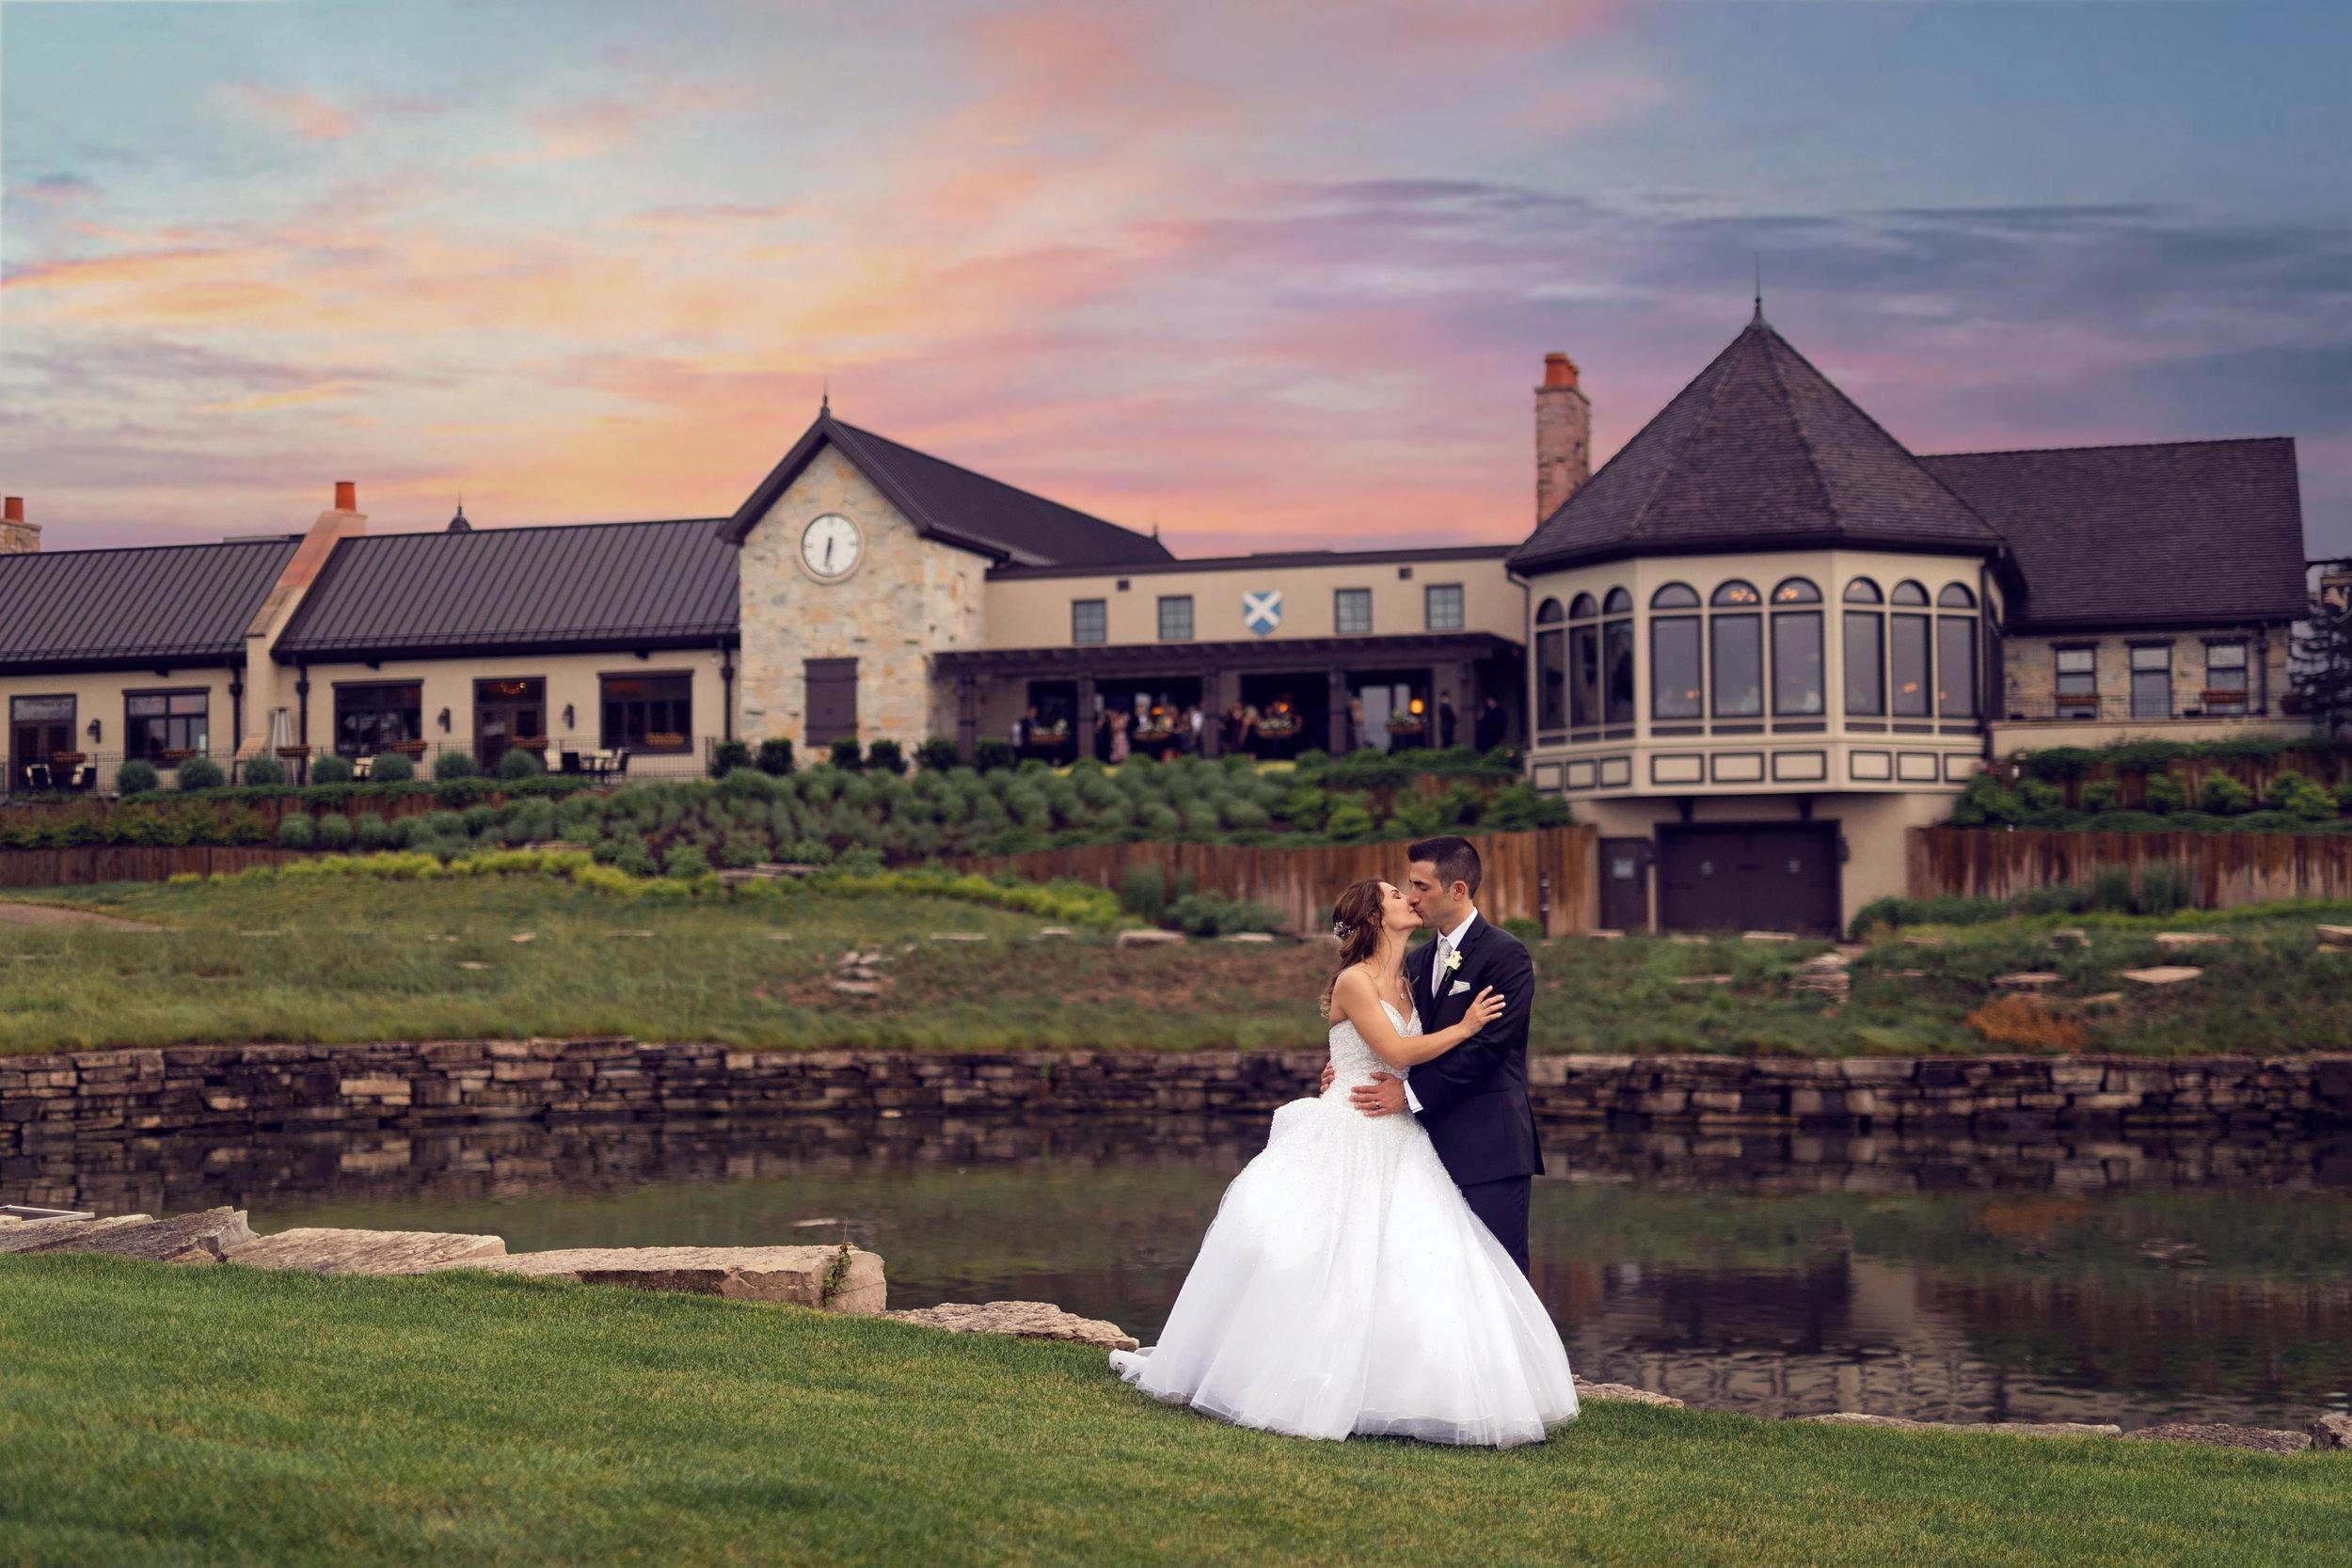 Wedding-couple-takes-photos-at-lowes-hardware-due-to-rain3.jpg